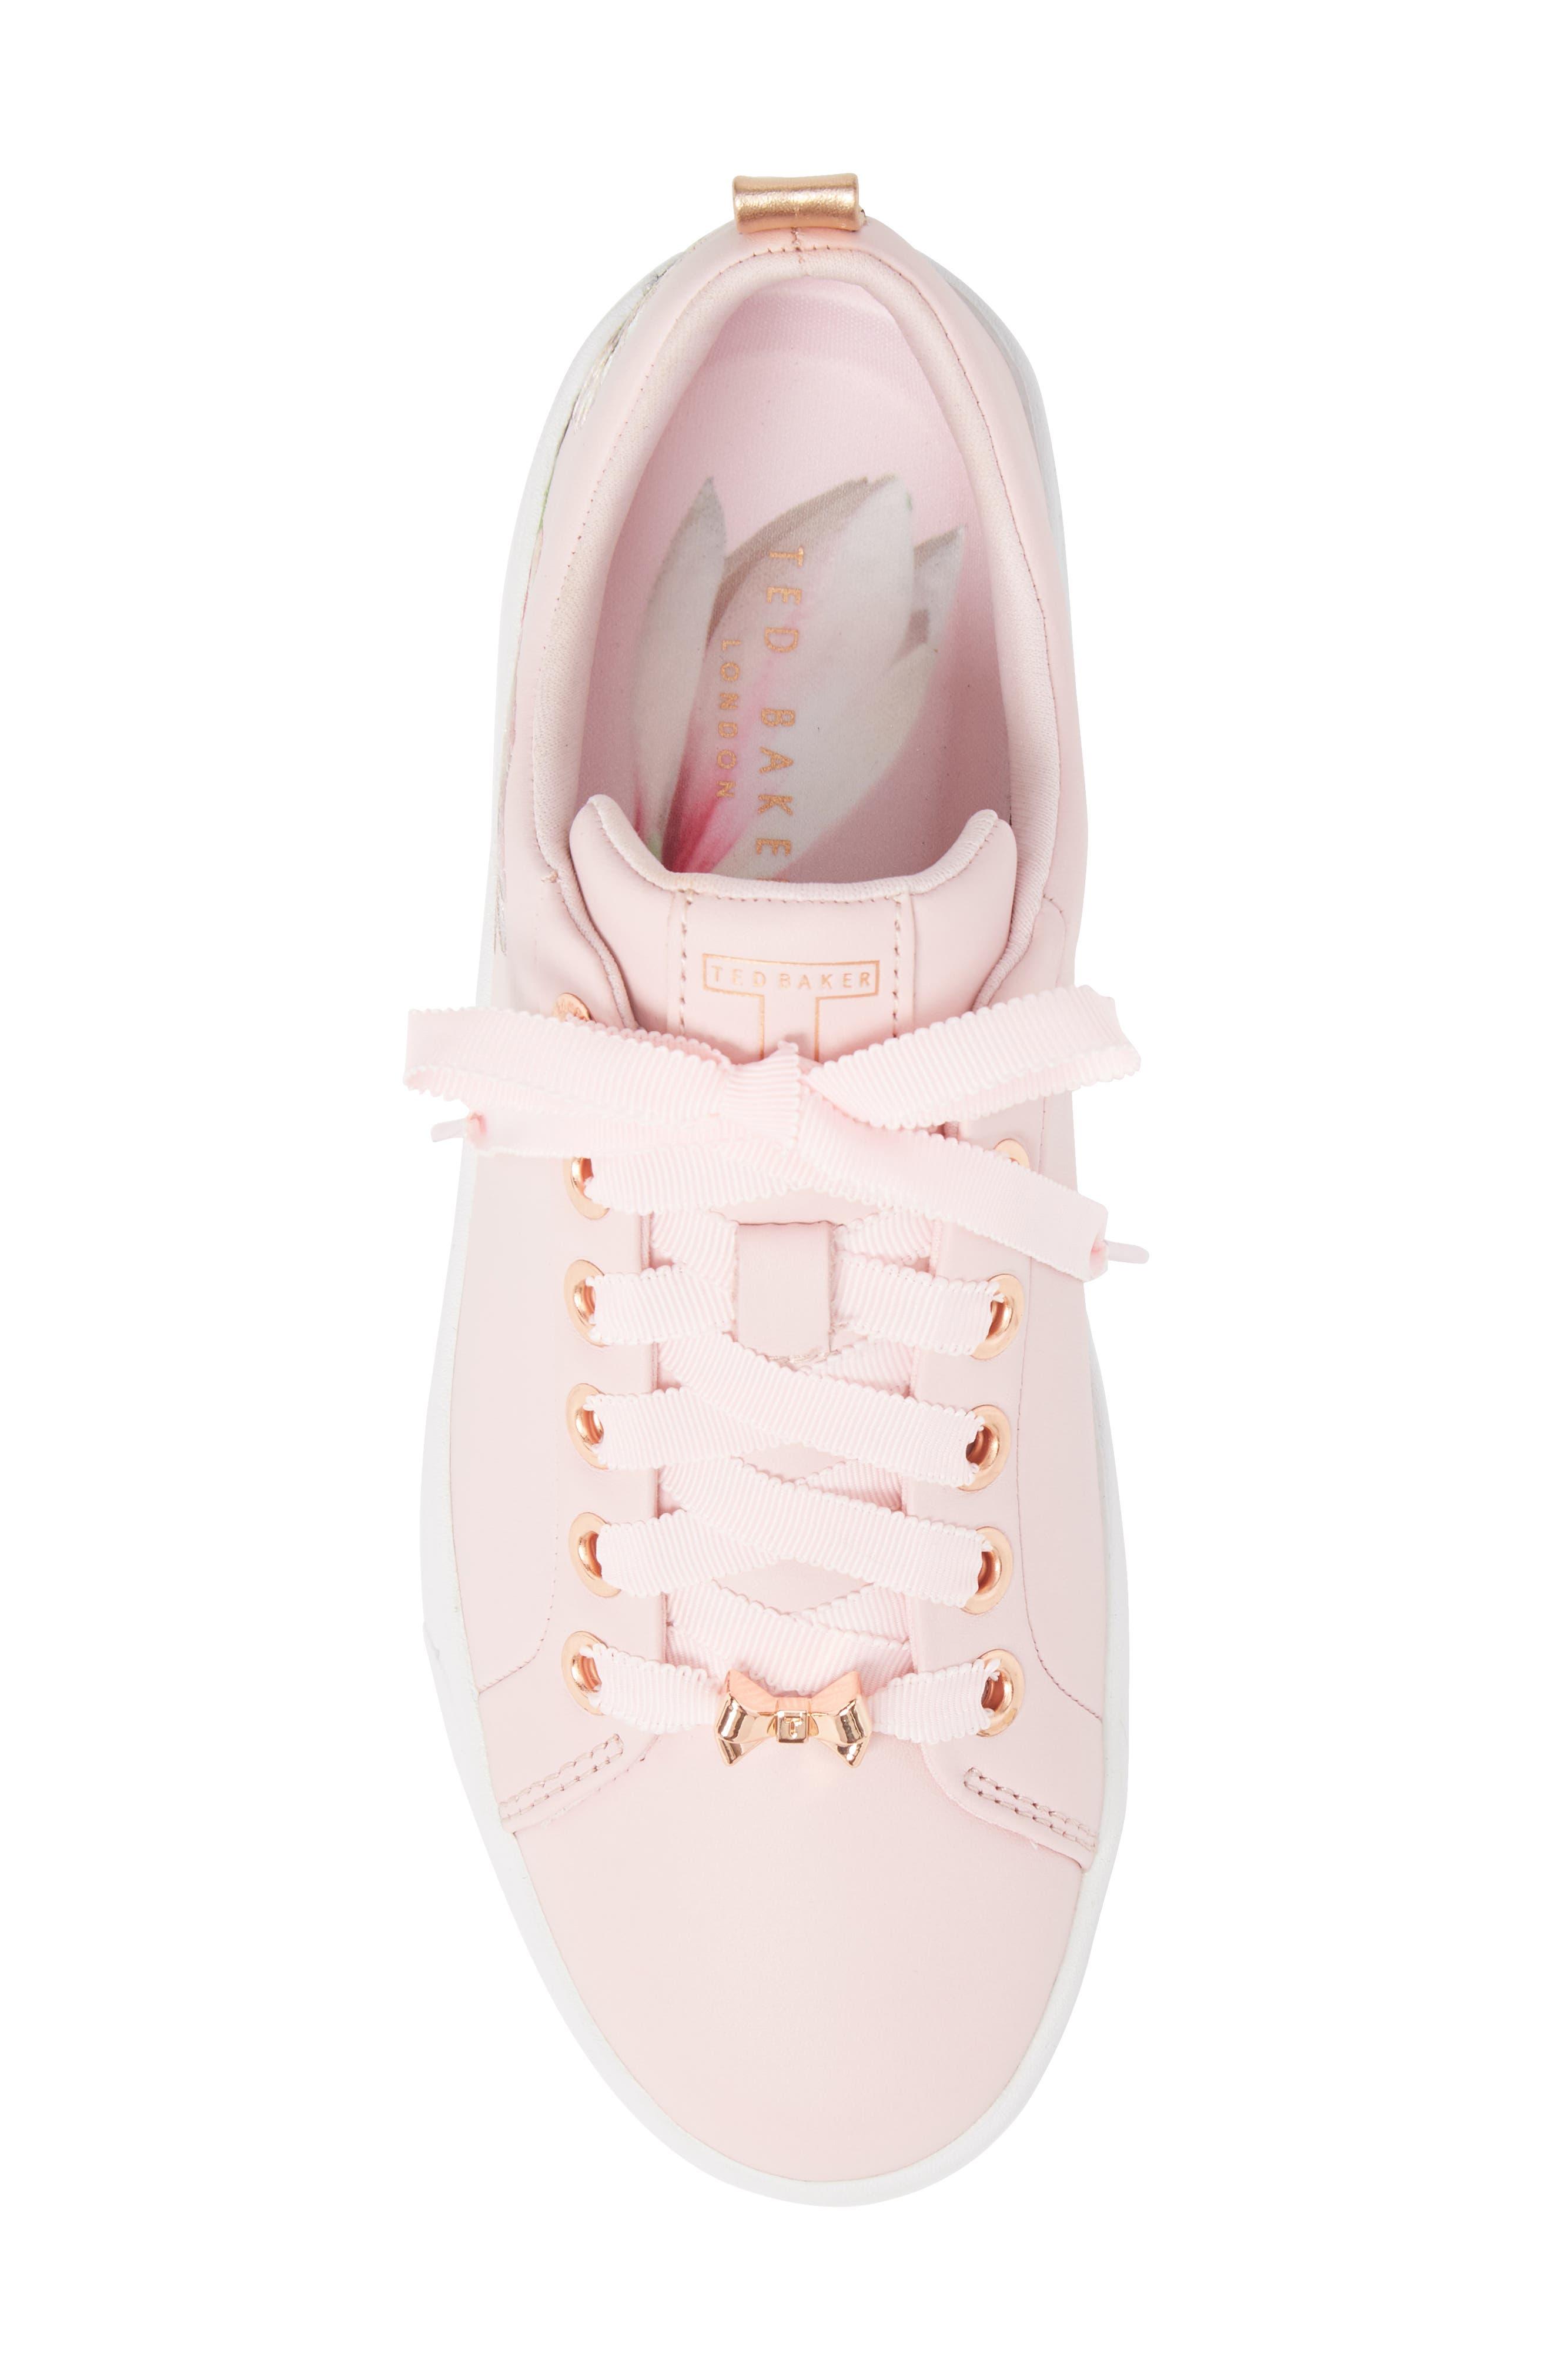 Kelleie Embroidered Sneaker,                             Alternate thumbnail 5, color,                             Mink Pink Leather